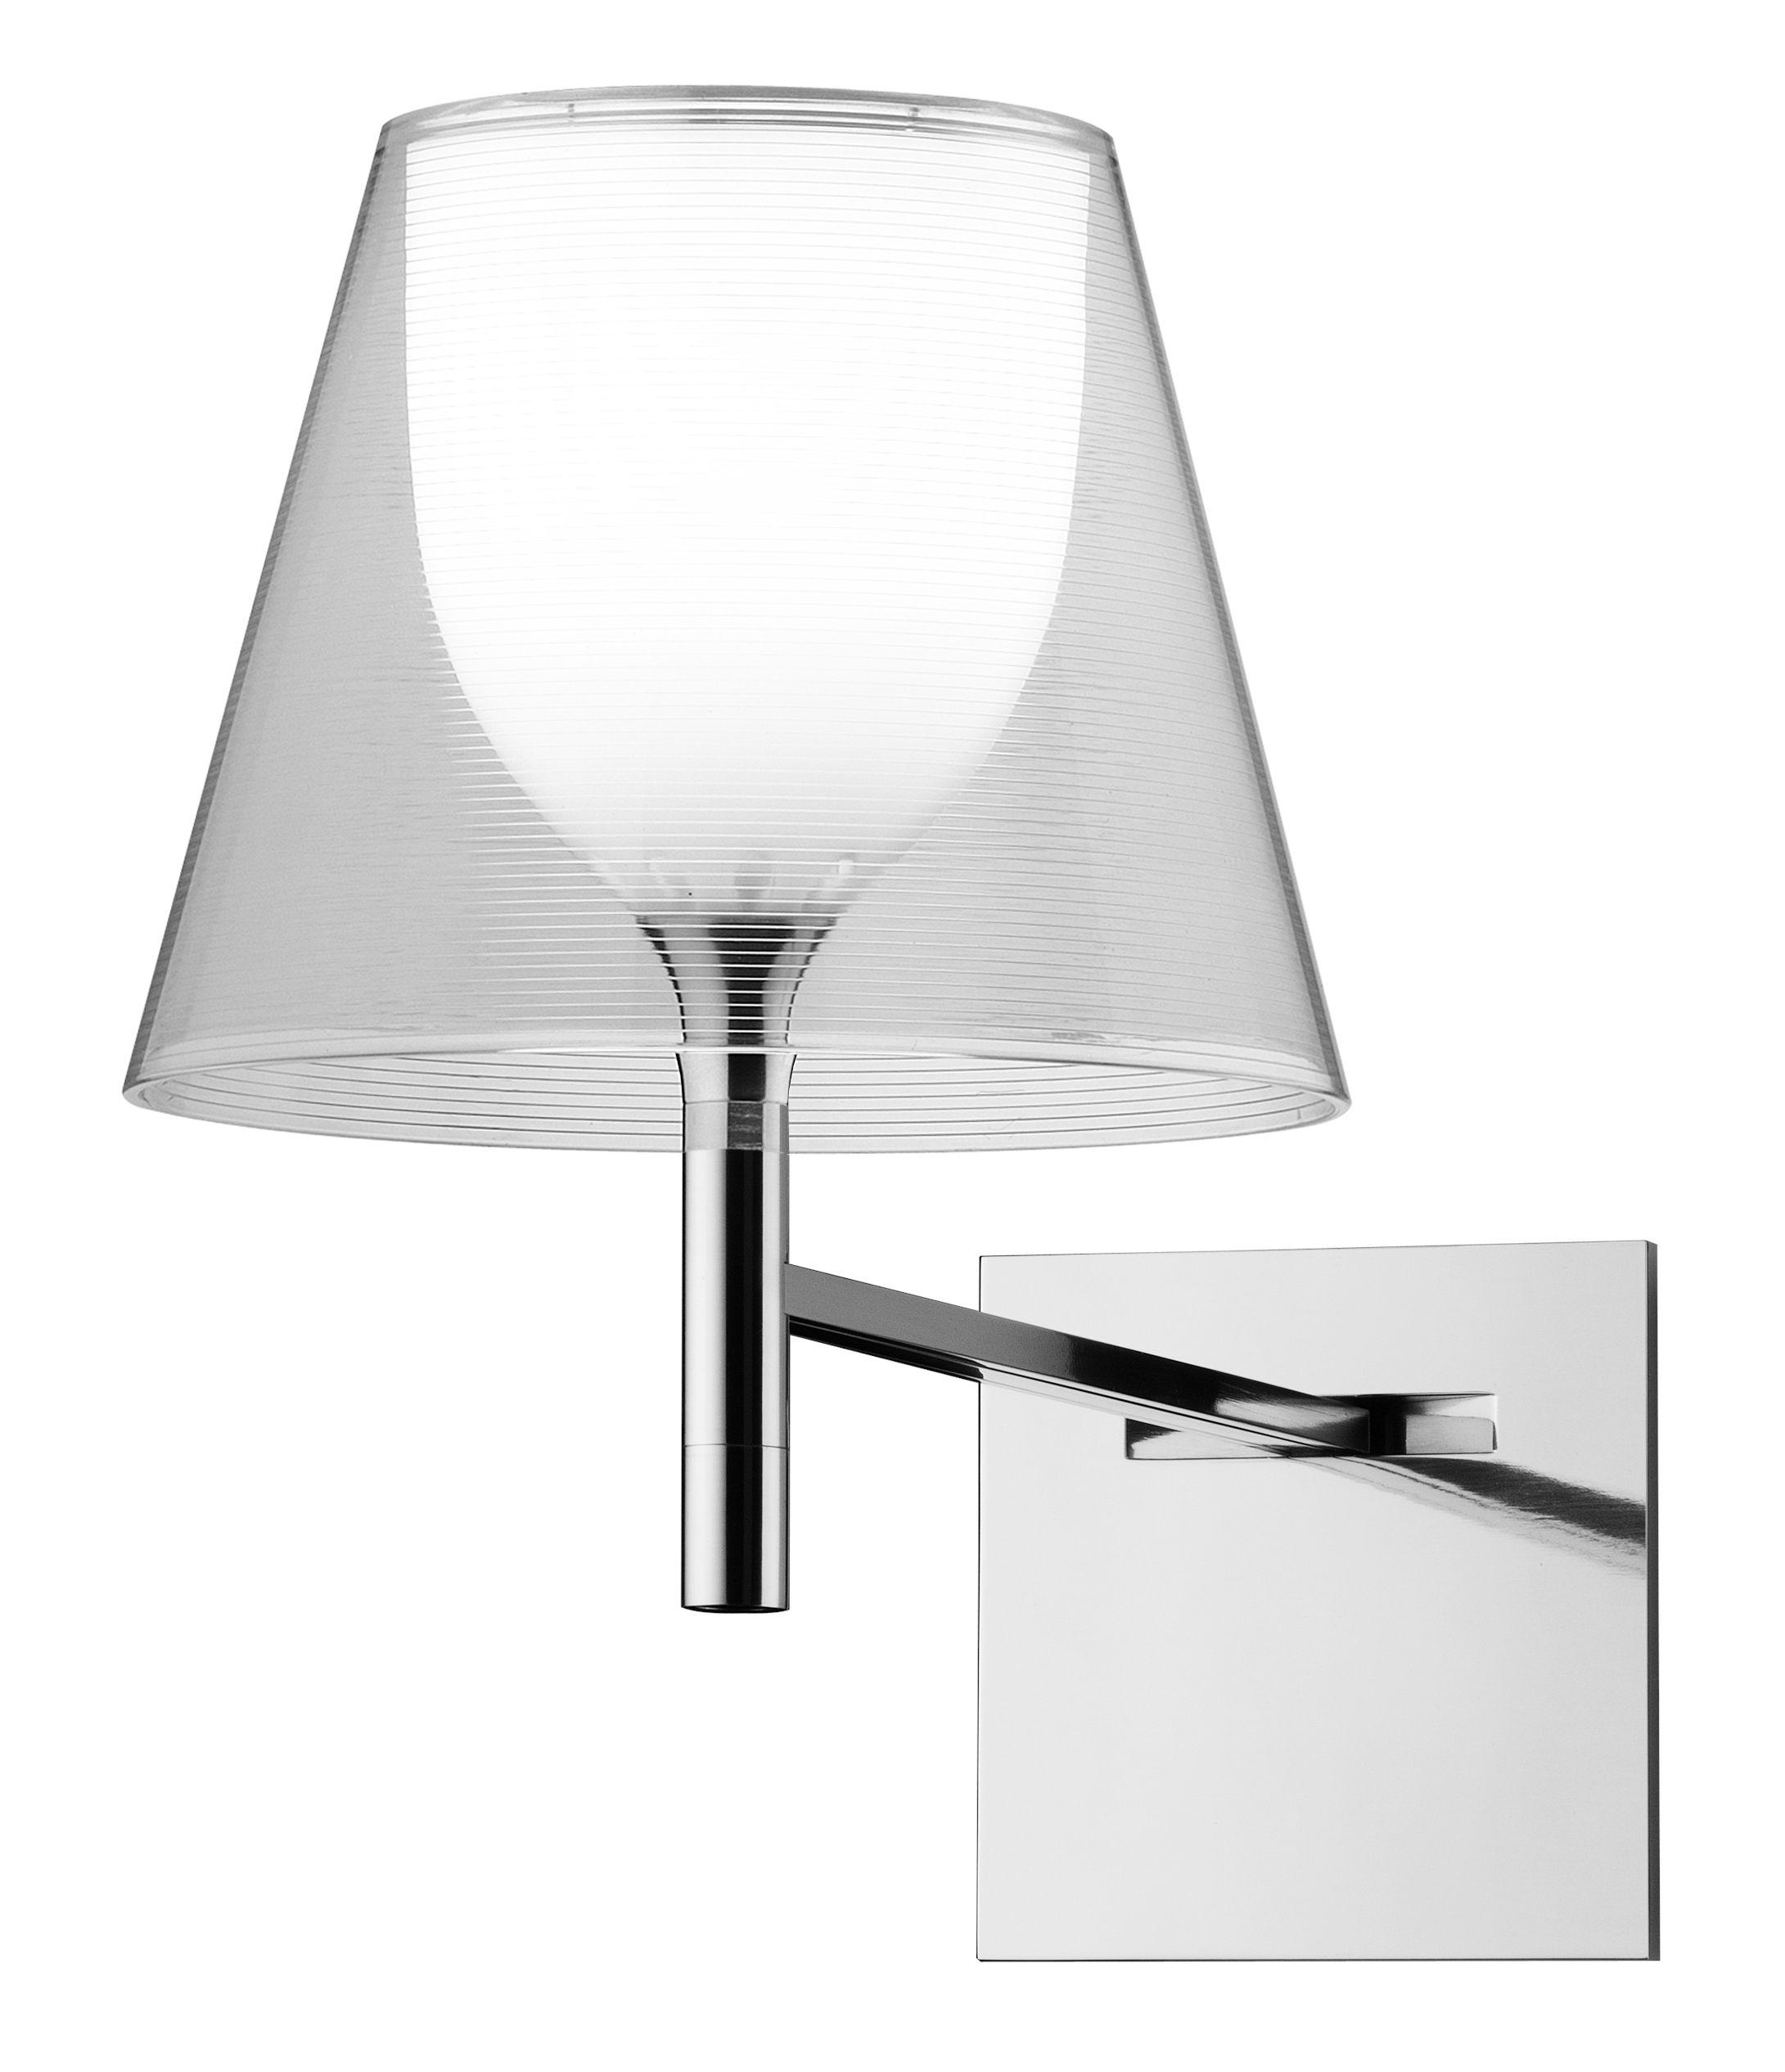 Leuchten - Wandleuchten - K Tribe W Wandleuchte - Flos - Transparent - PMMA, poliertes Aluminium